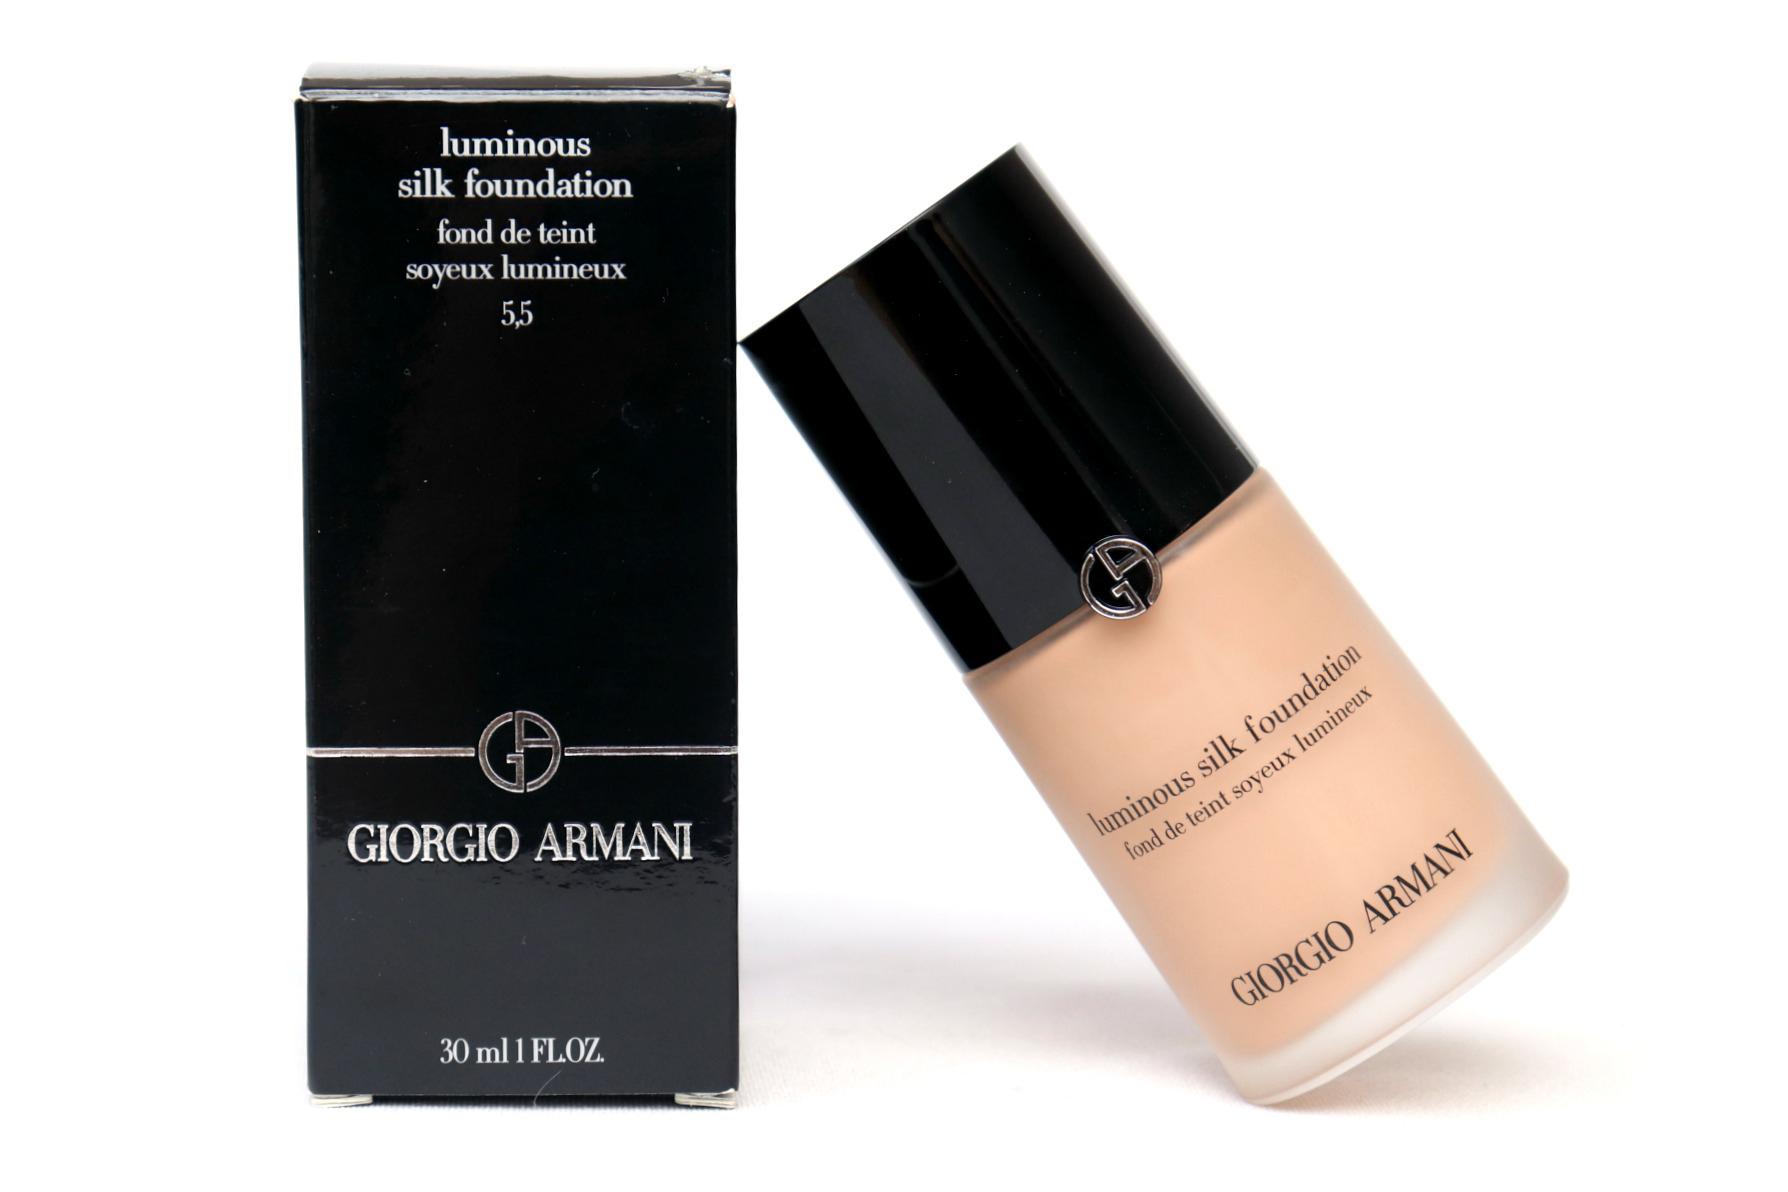 Giorgio Armani Luminous Silk Foundation Review The Beautynerd